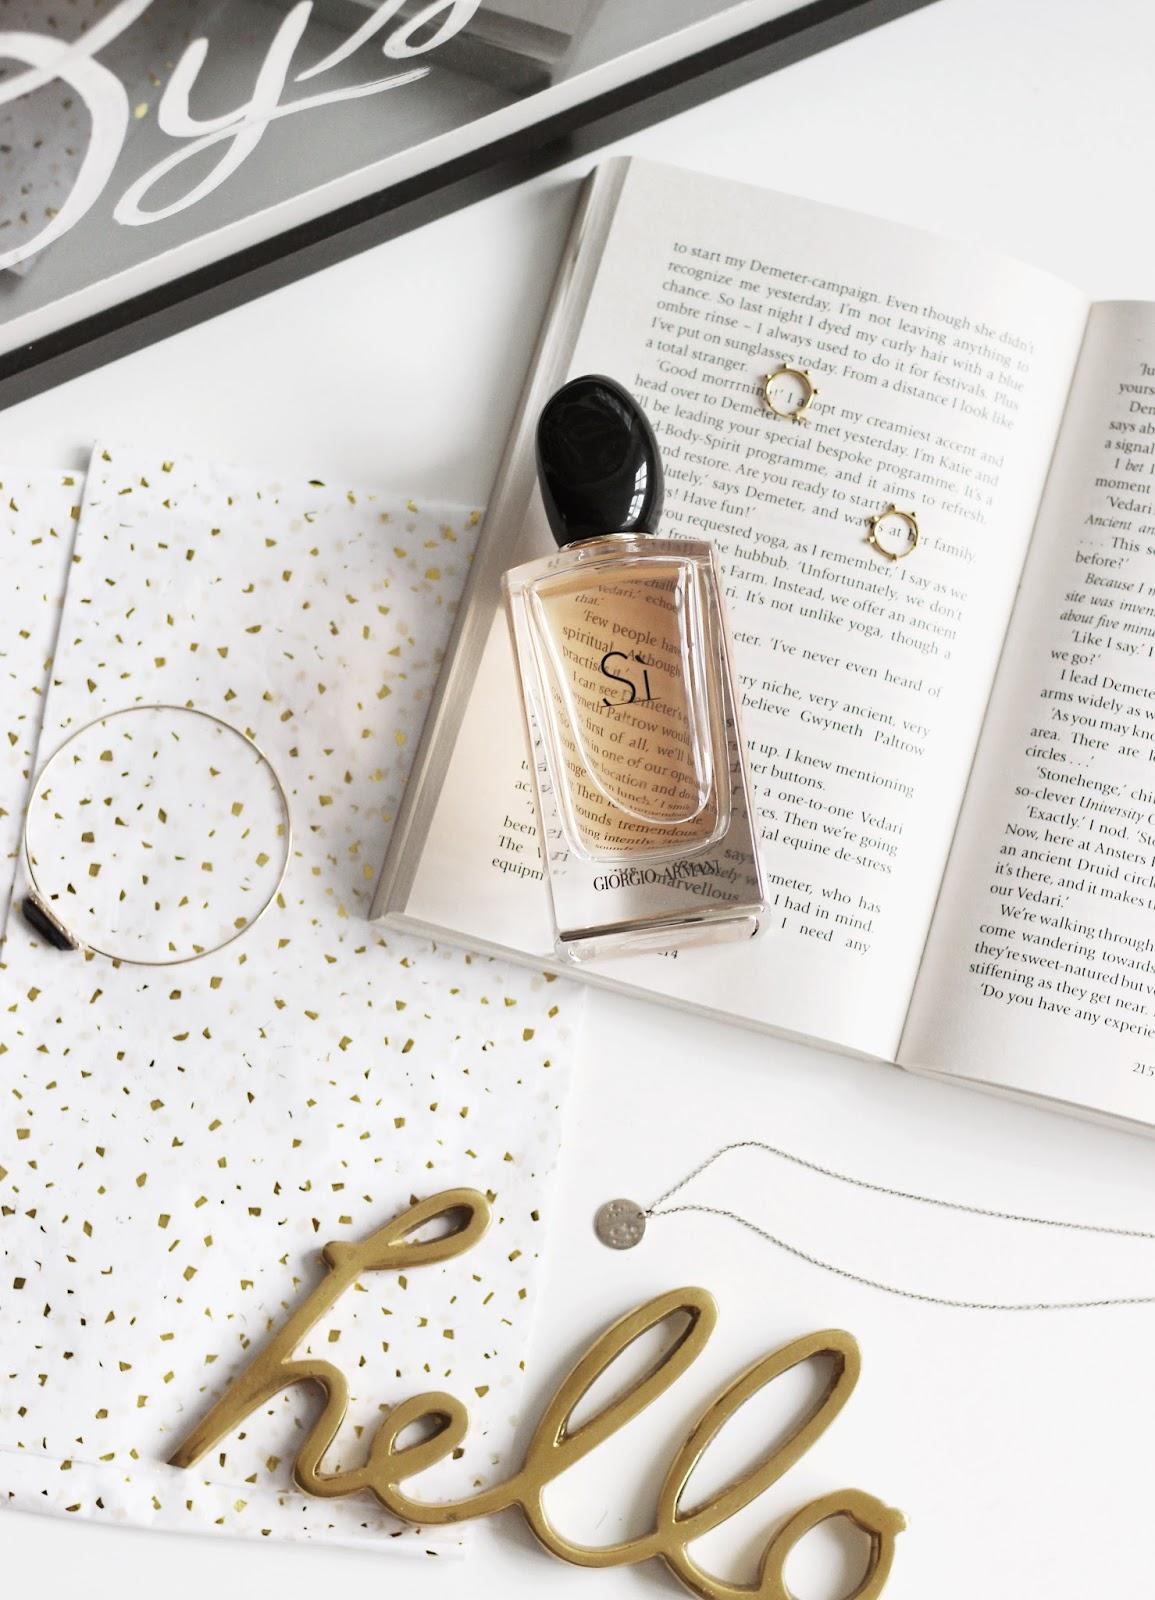 Giorgio Armani Si Perfume Review